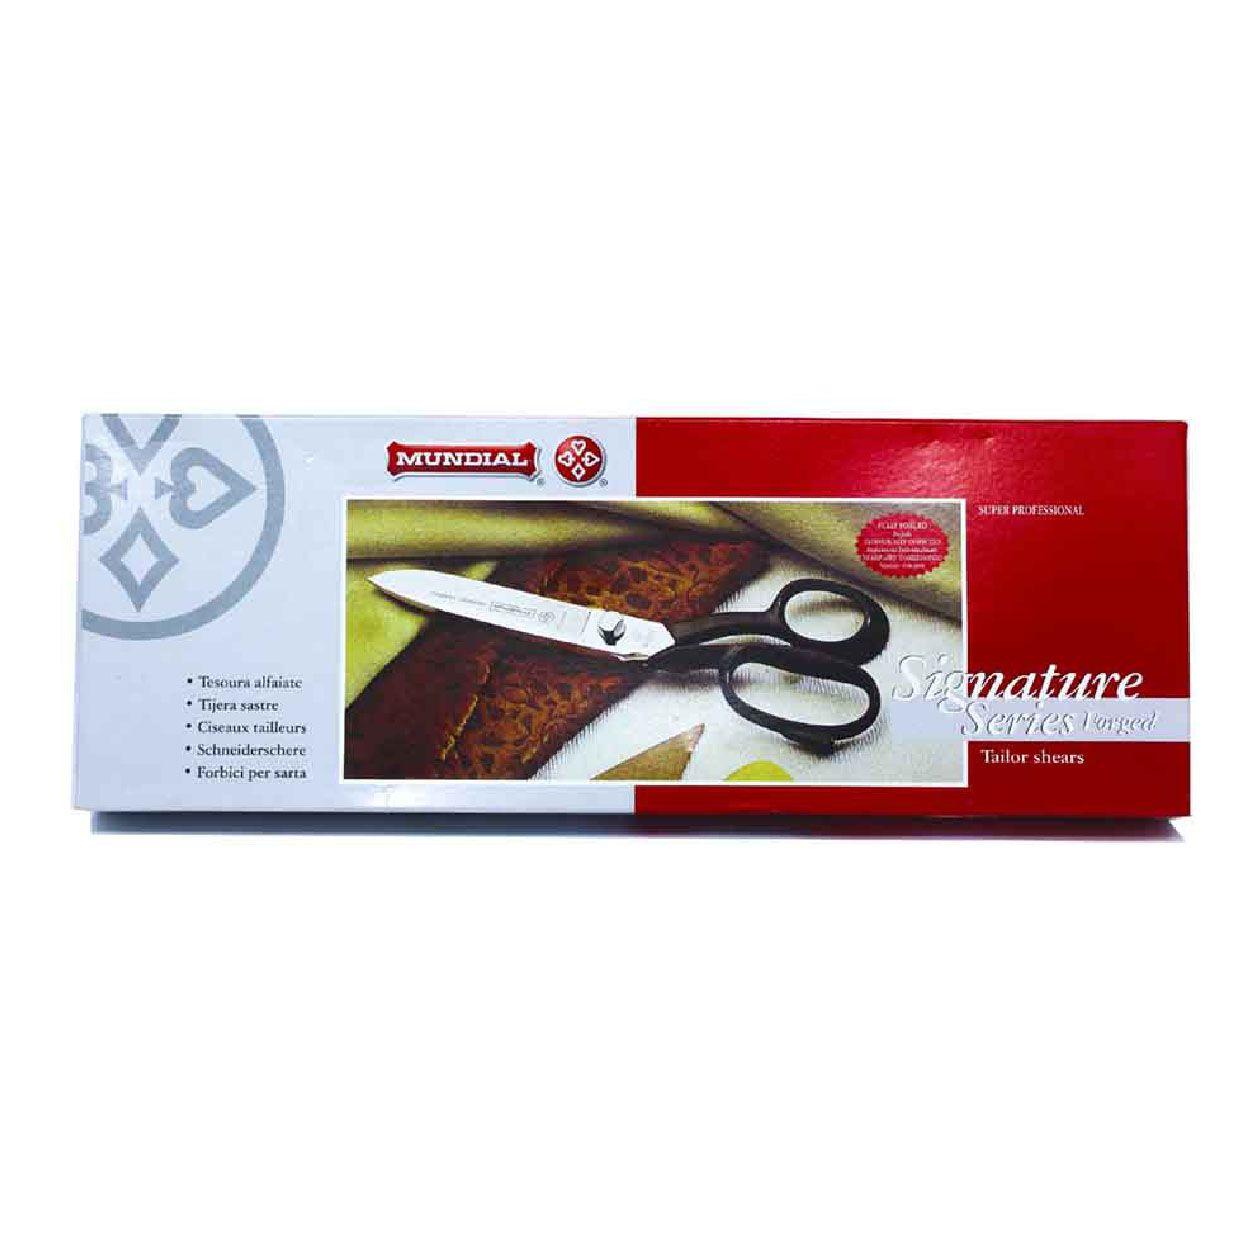 "kit 3 Tesouras de alfaiate Mundial 8"" aço carbono, reforçada, Profissional, Signature Mundial"